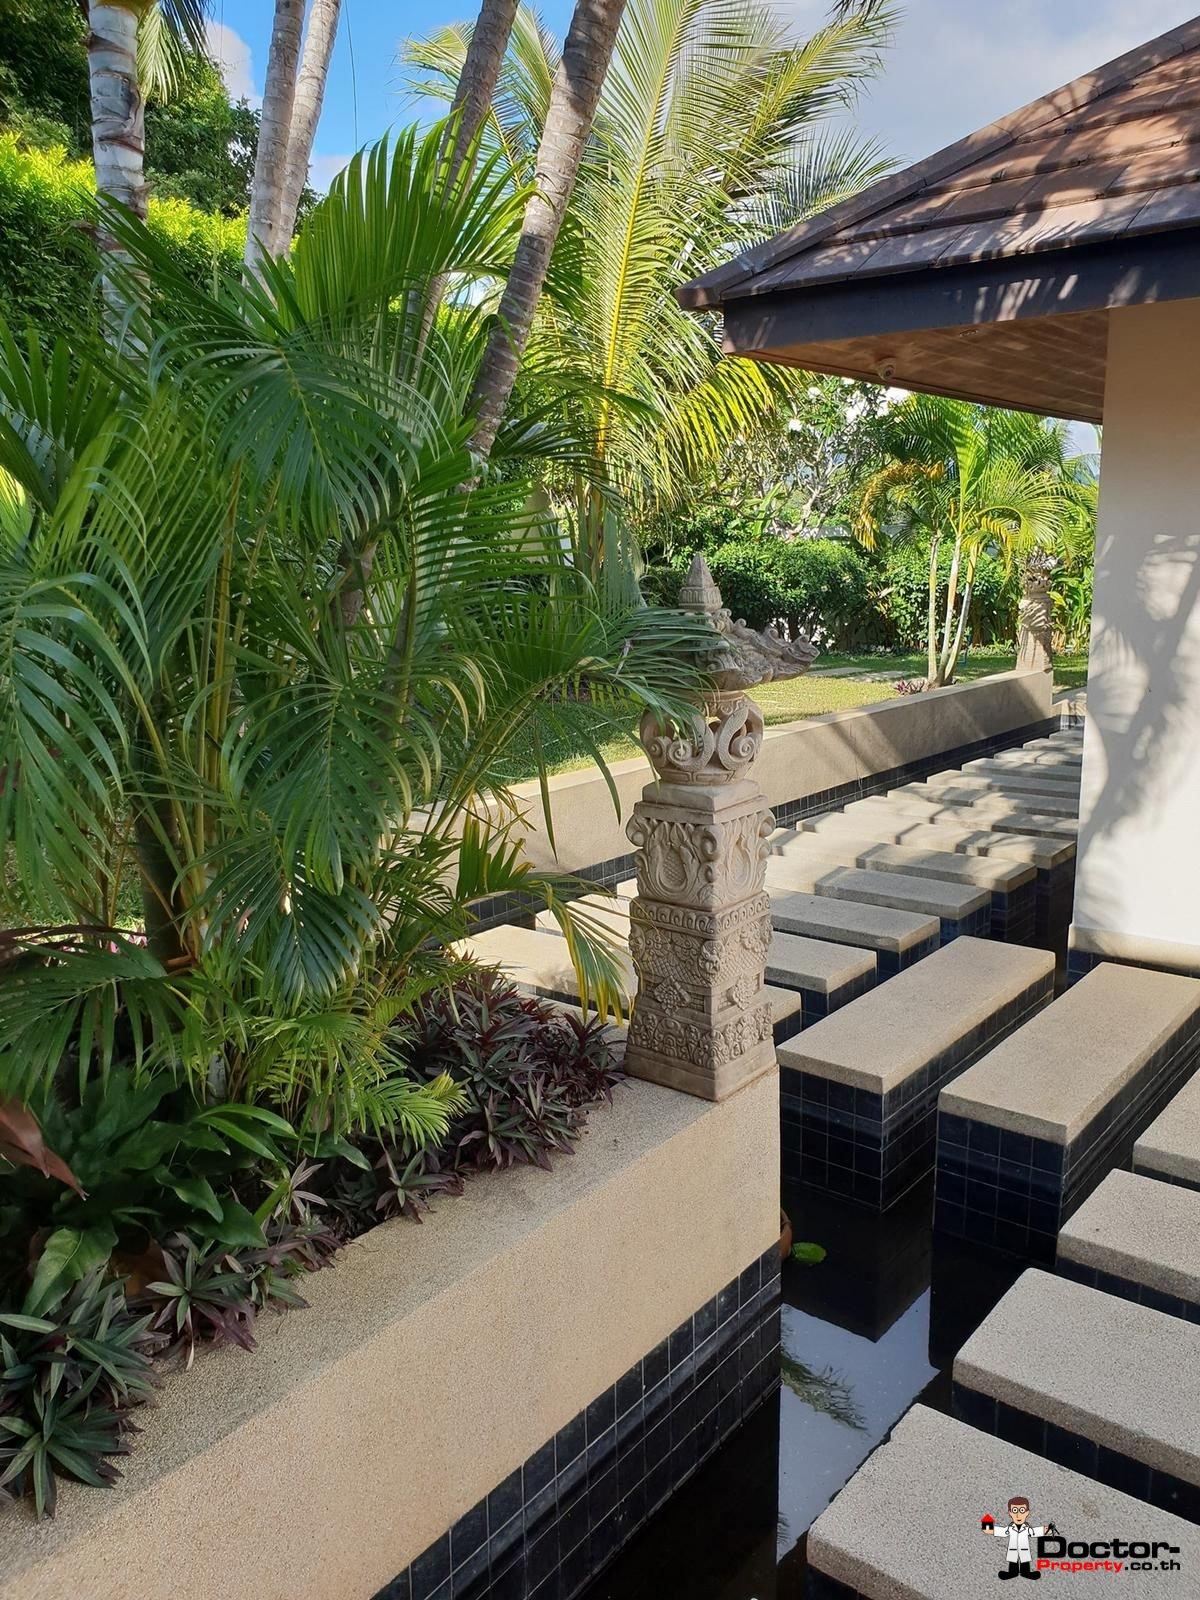 6 Bedroom Villa with Sea View - Bophut - Koh Samui - for sale 12